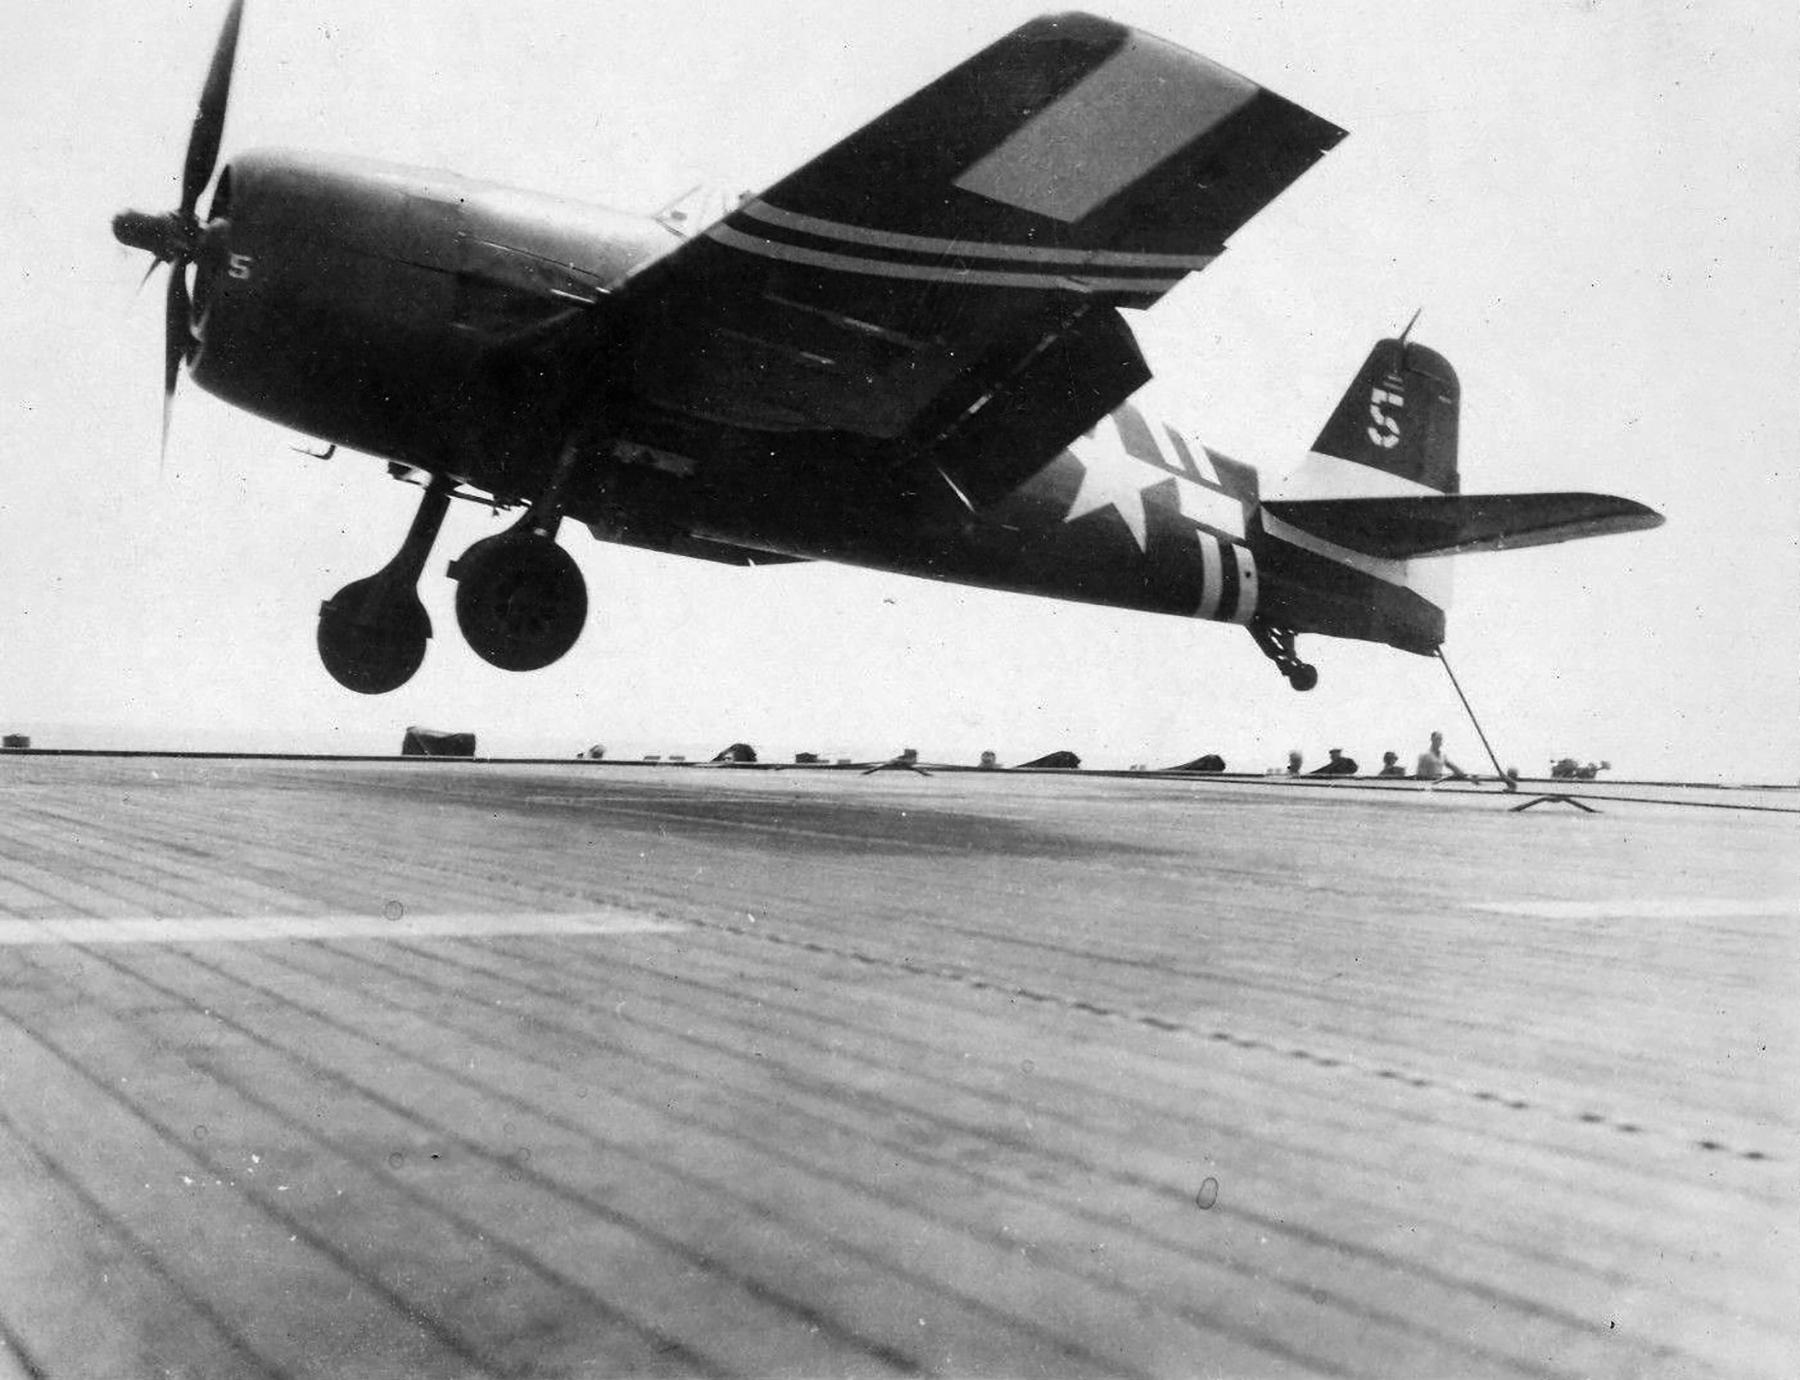 Grumman F6F 5 Hellcat VF 36 White 5 landing mishap CVE 112 USS Siboney Aug 1945 May 1946 02